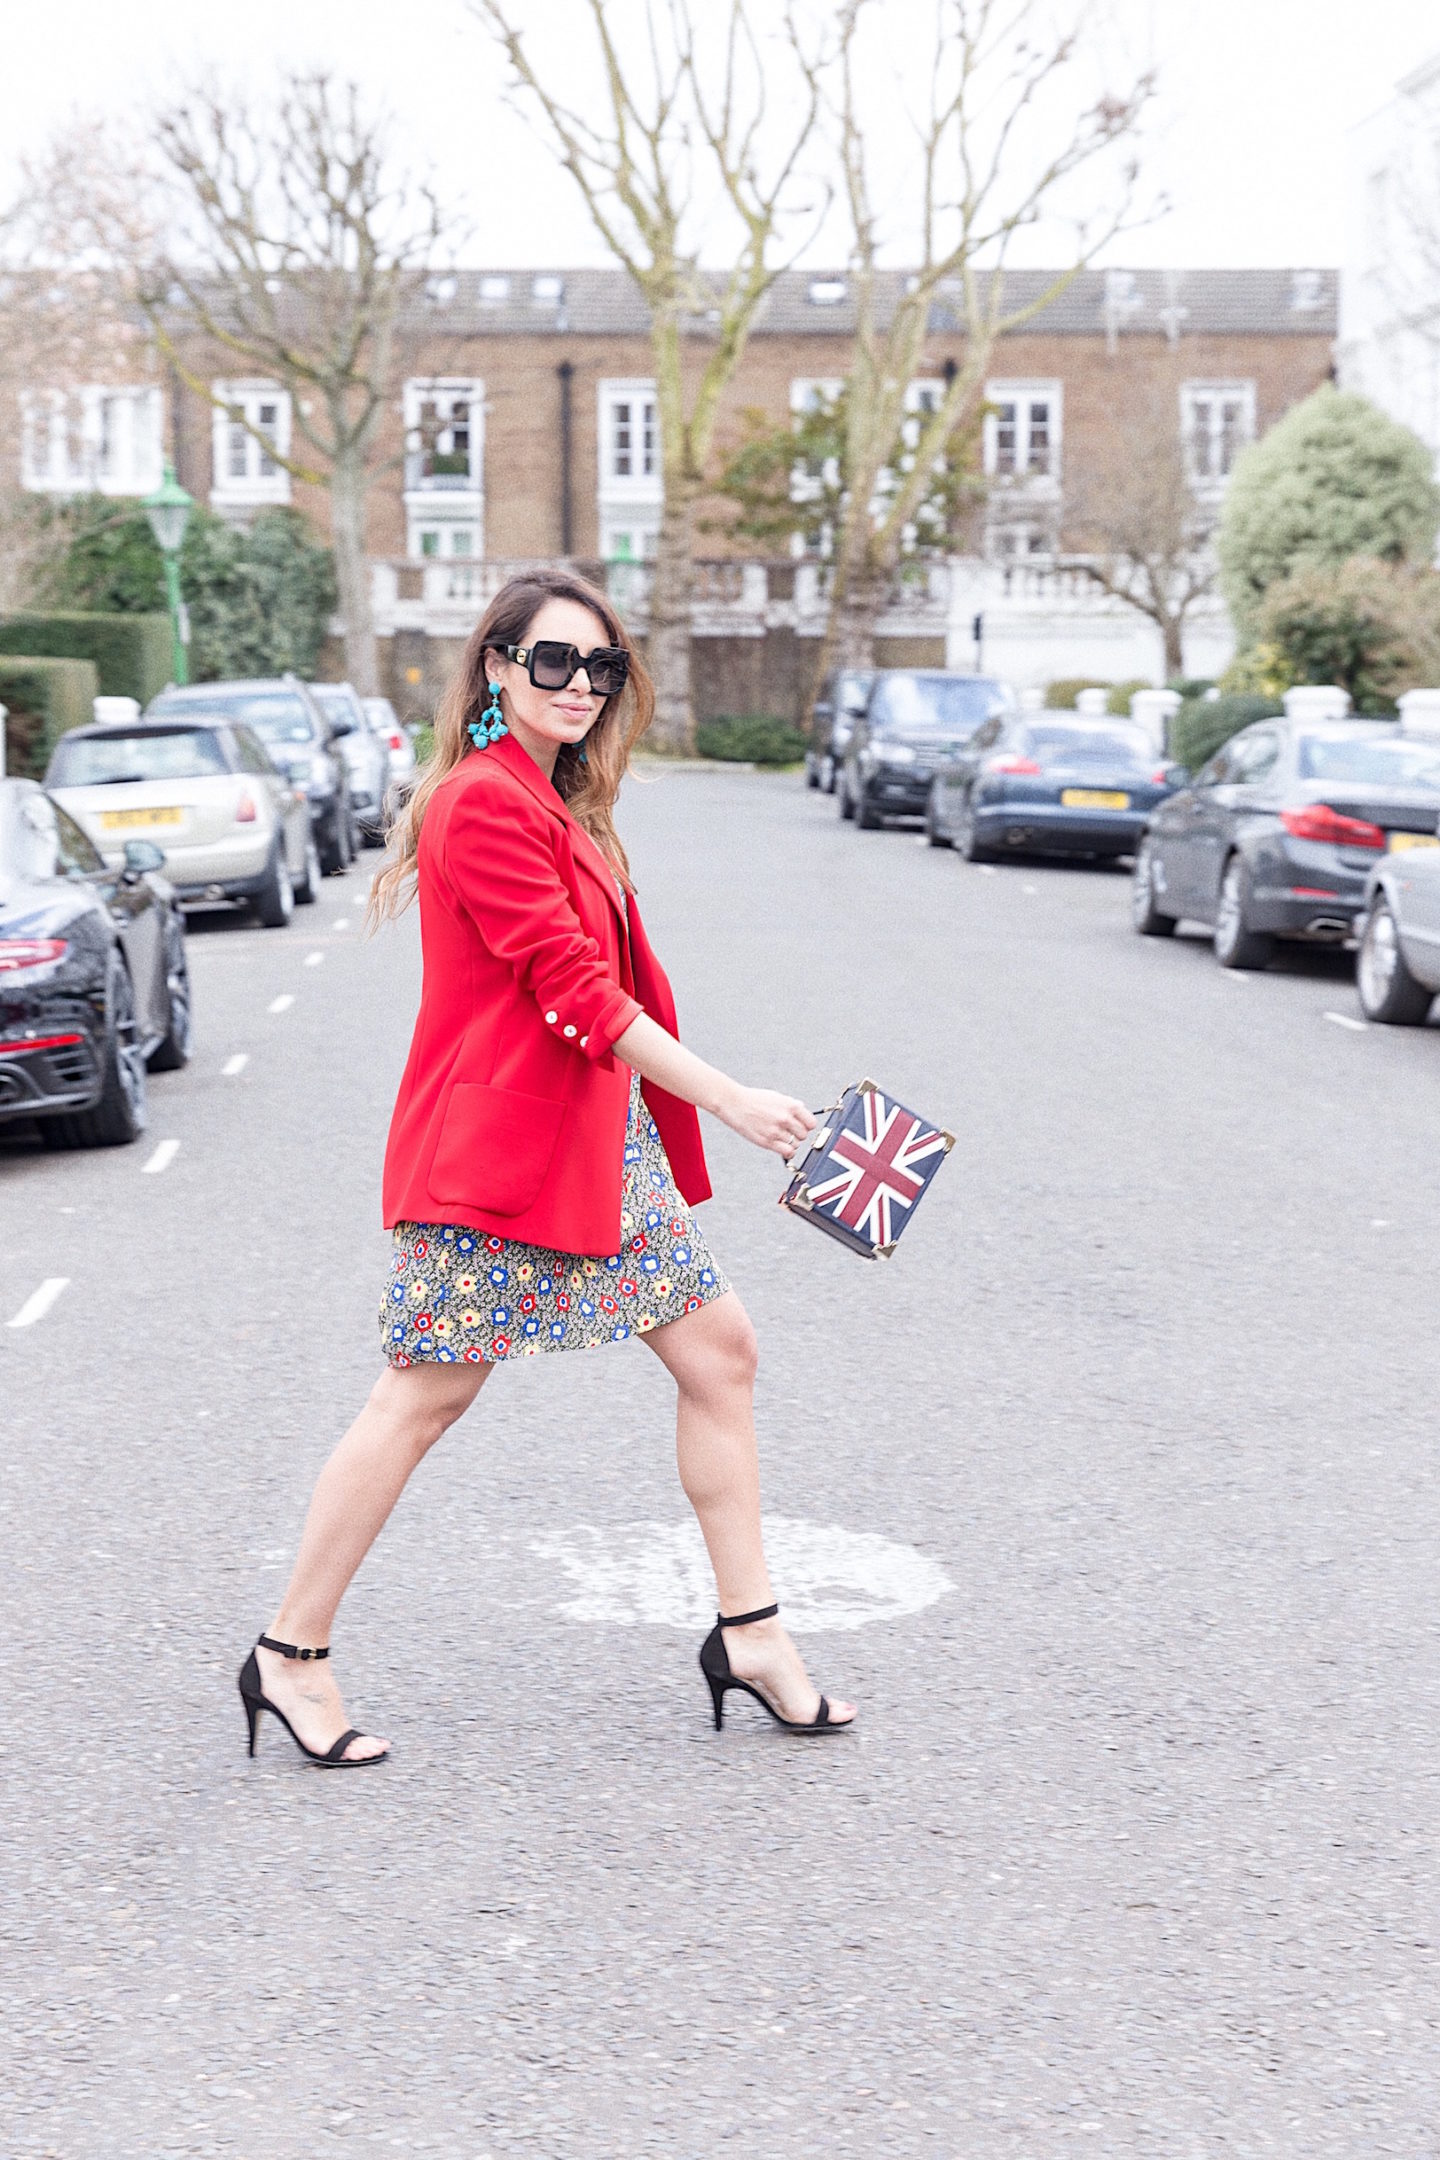 compañia fantastica vestido street style